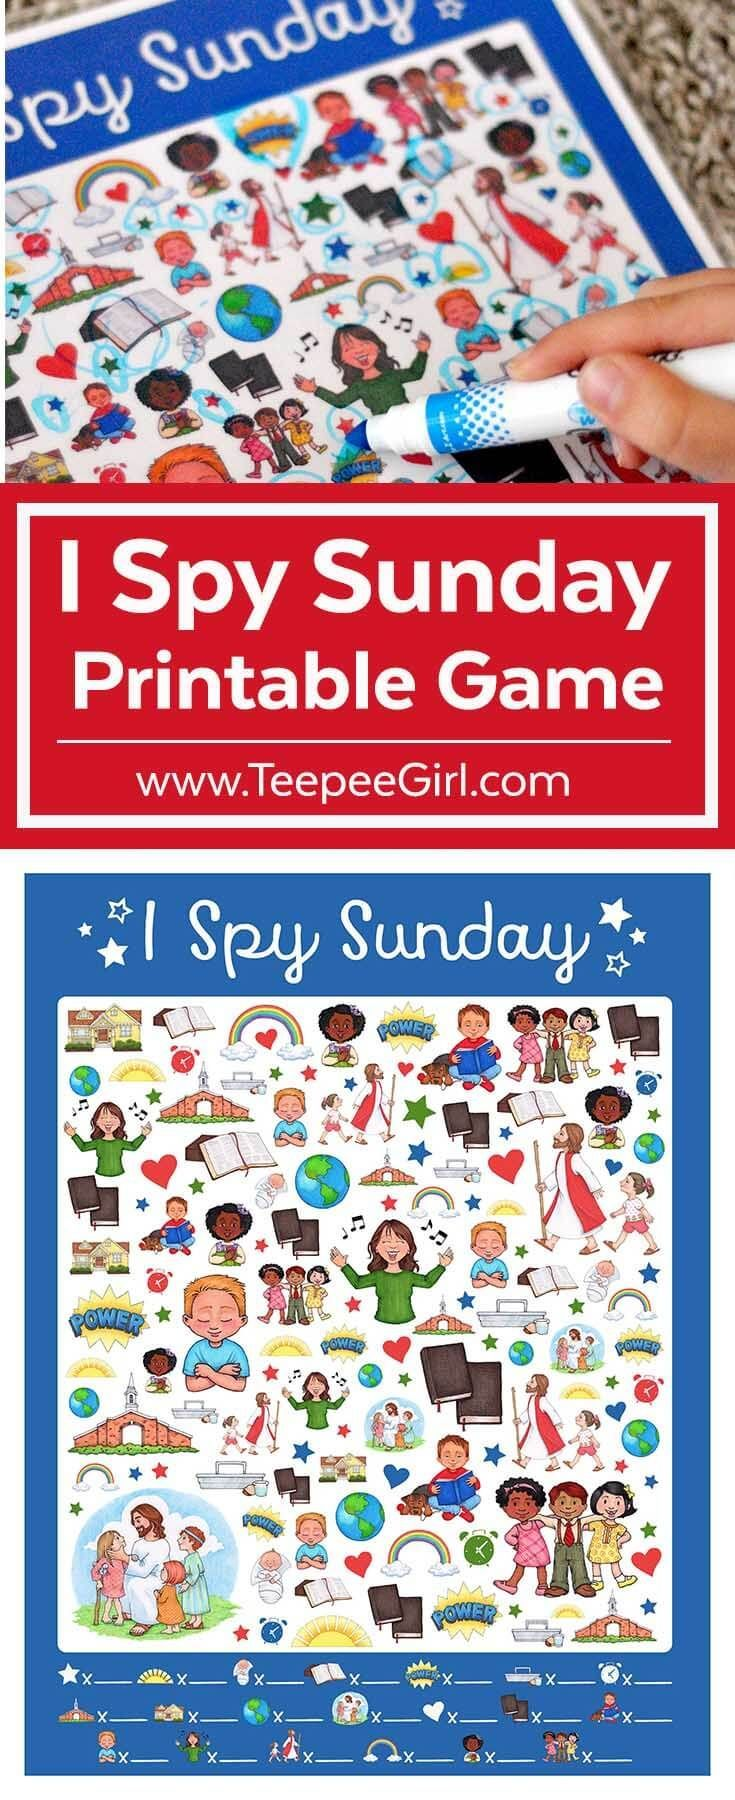 I Spy Sunday Printable Game Sunday School Activities